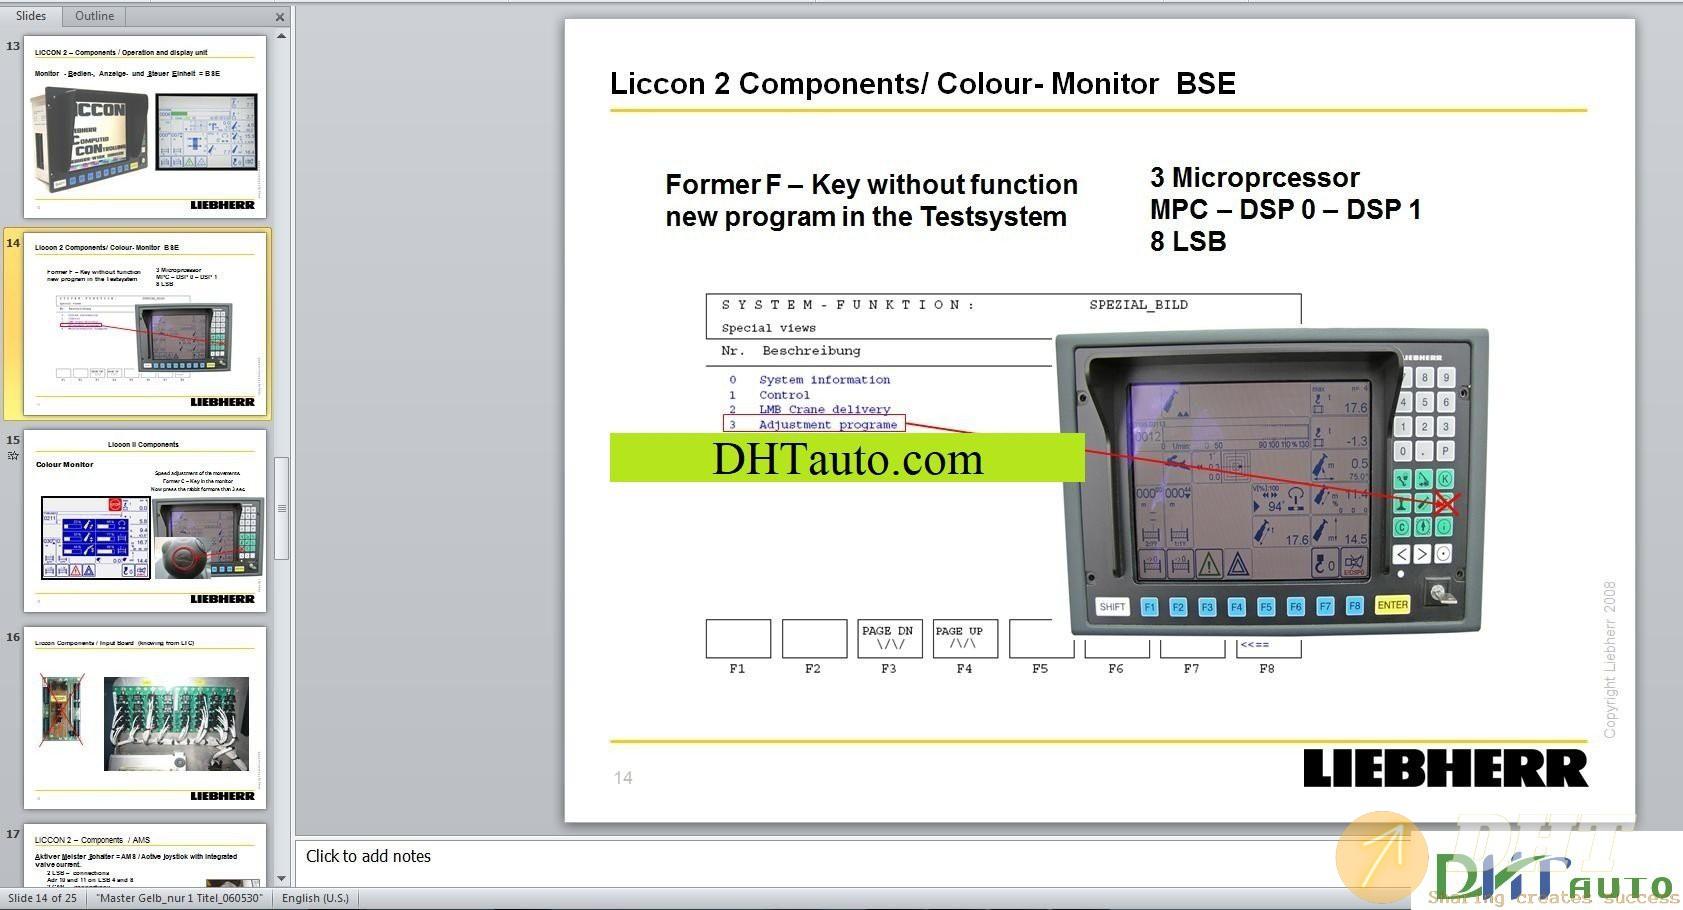 Liebherr-Machine-Crane-Service-Operating-Manual-4.jpg